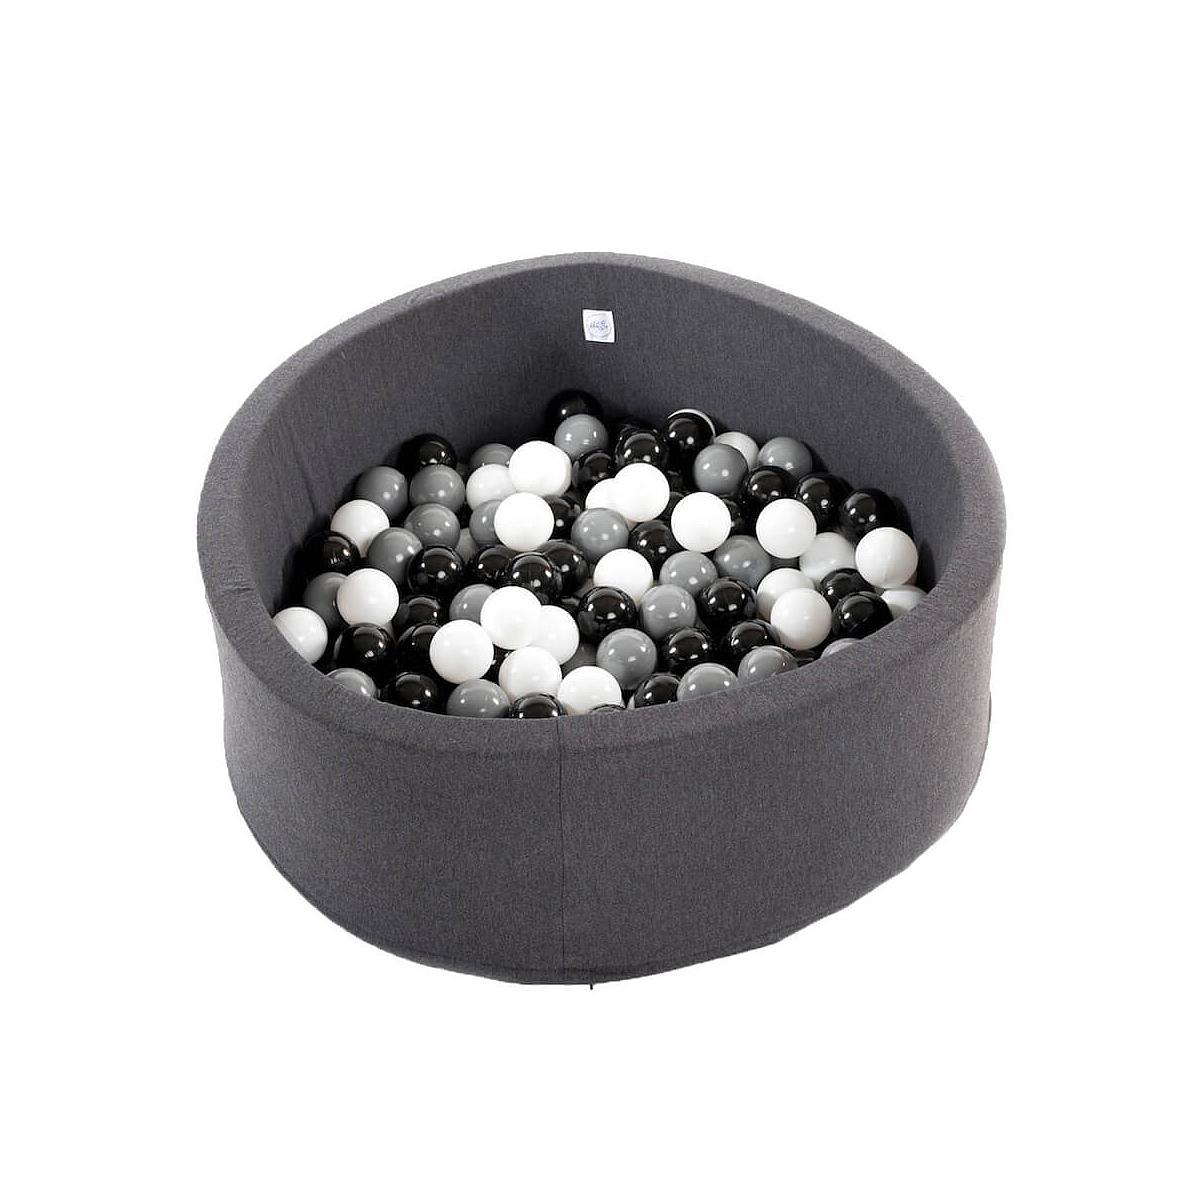 Piscine 200 boules DARK GREY Minibe noir-blanc-gris